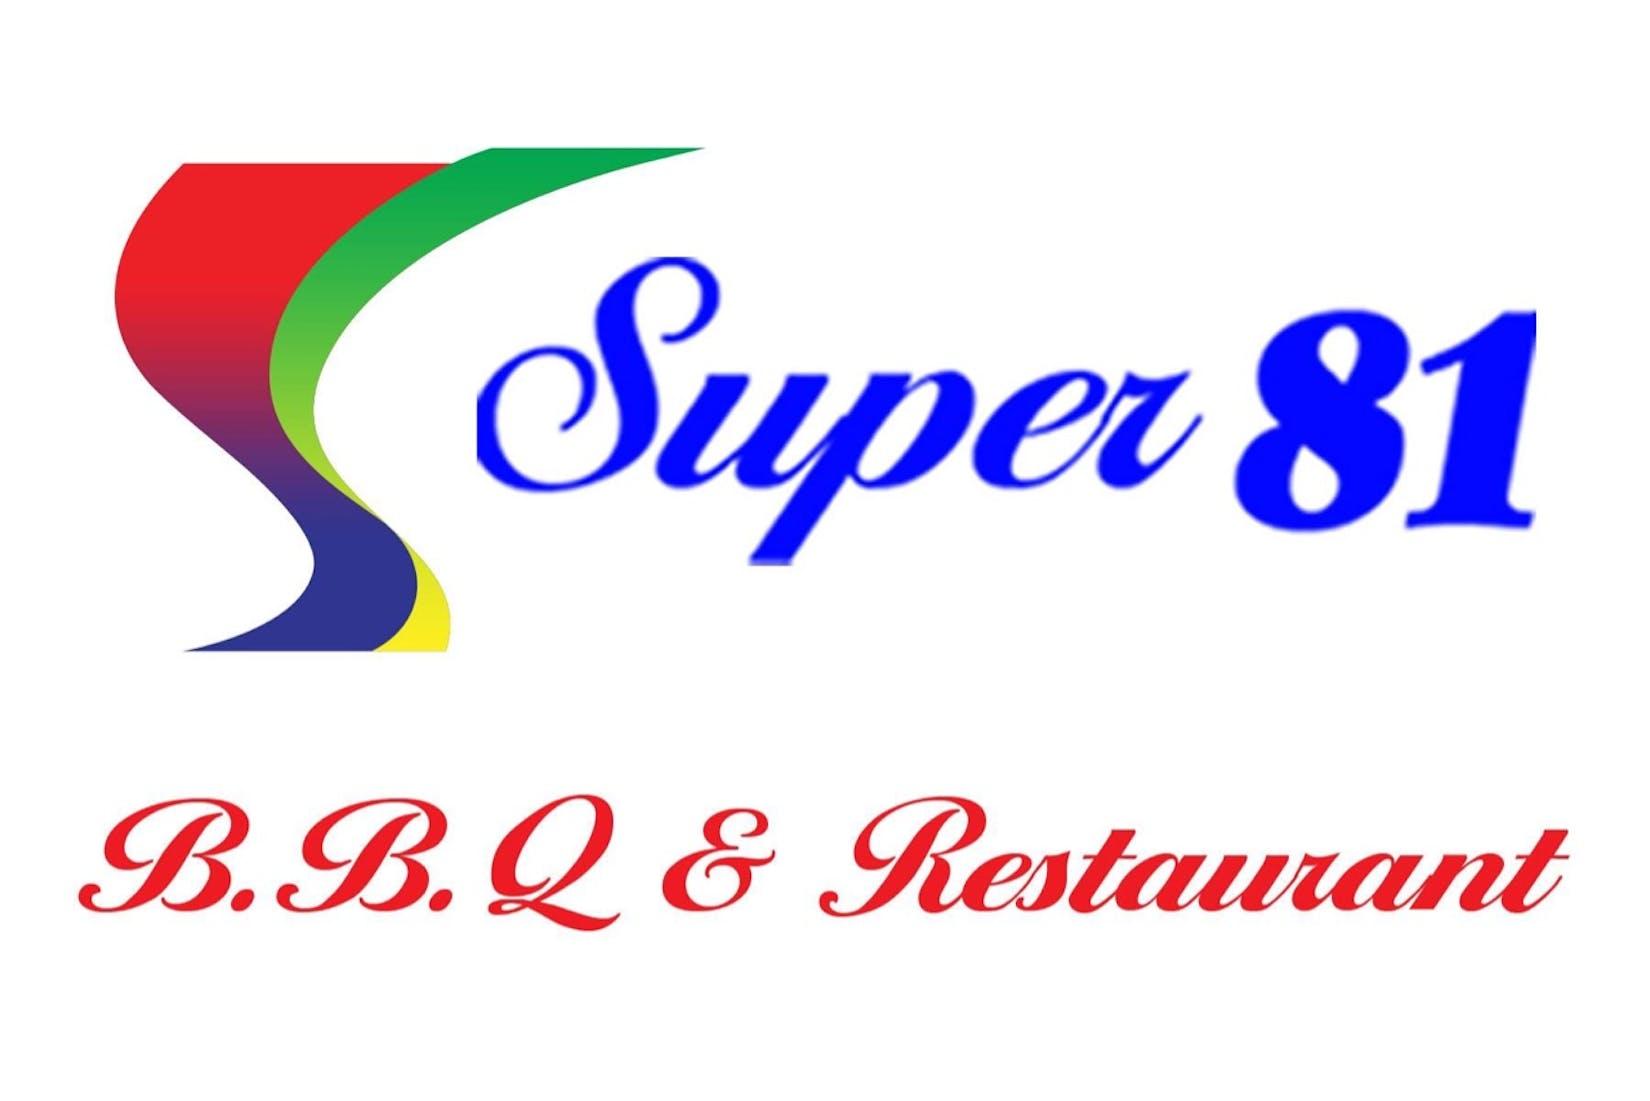 Super-81 BBQ & Restaurant ( 2 ) | yathar